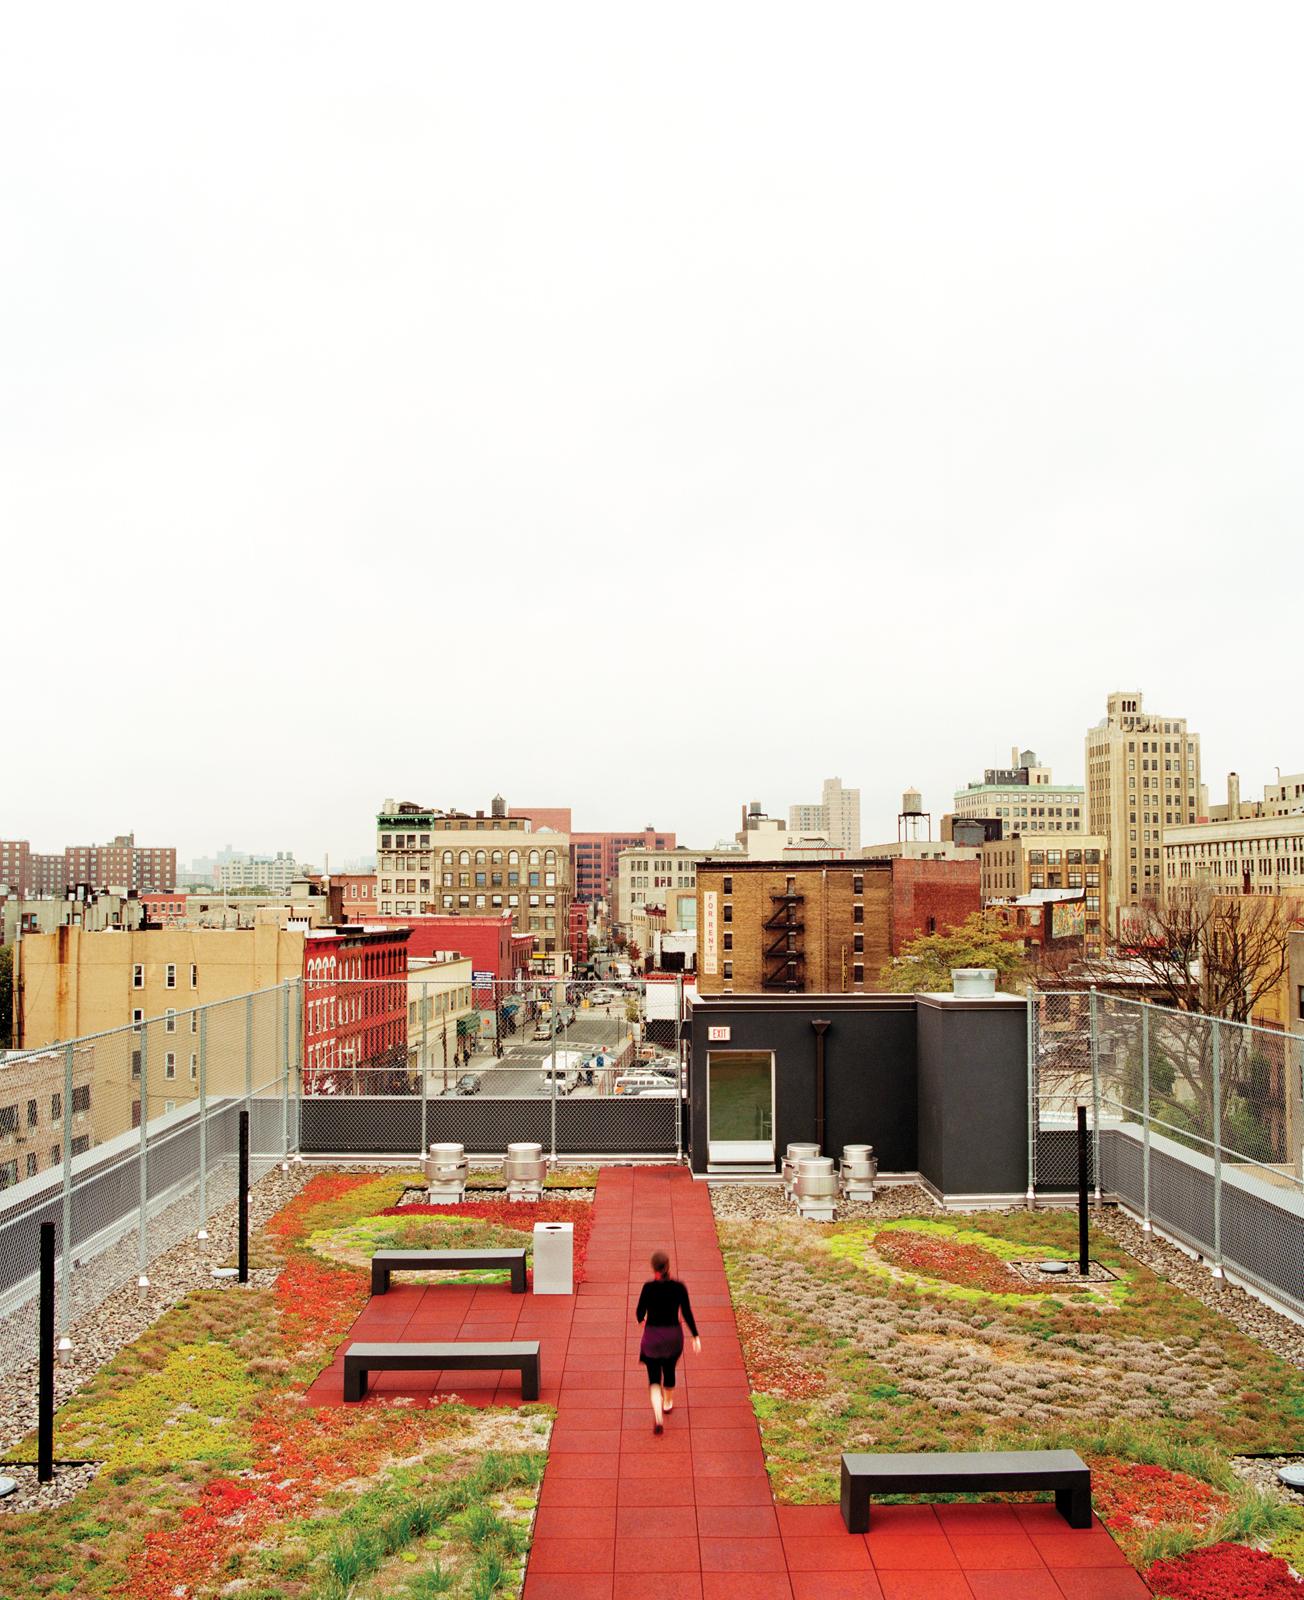 Rooftop garden park in Bronx New York